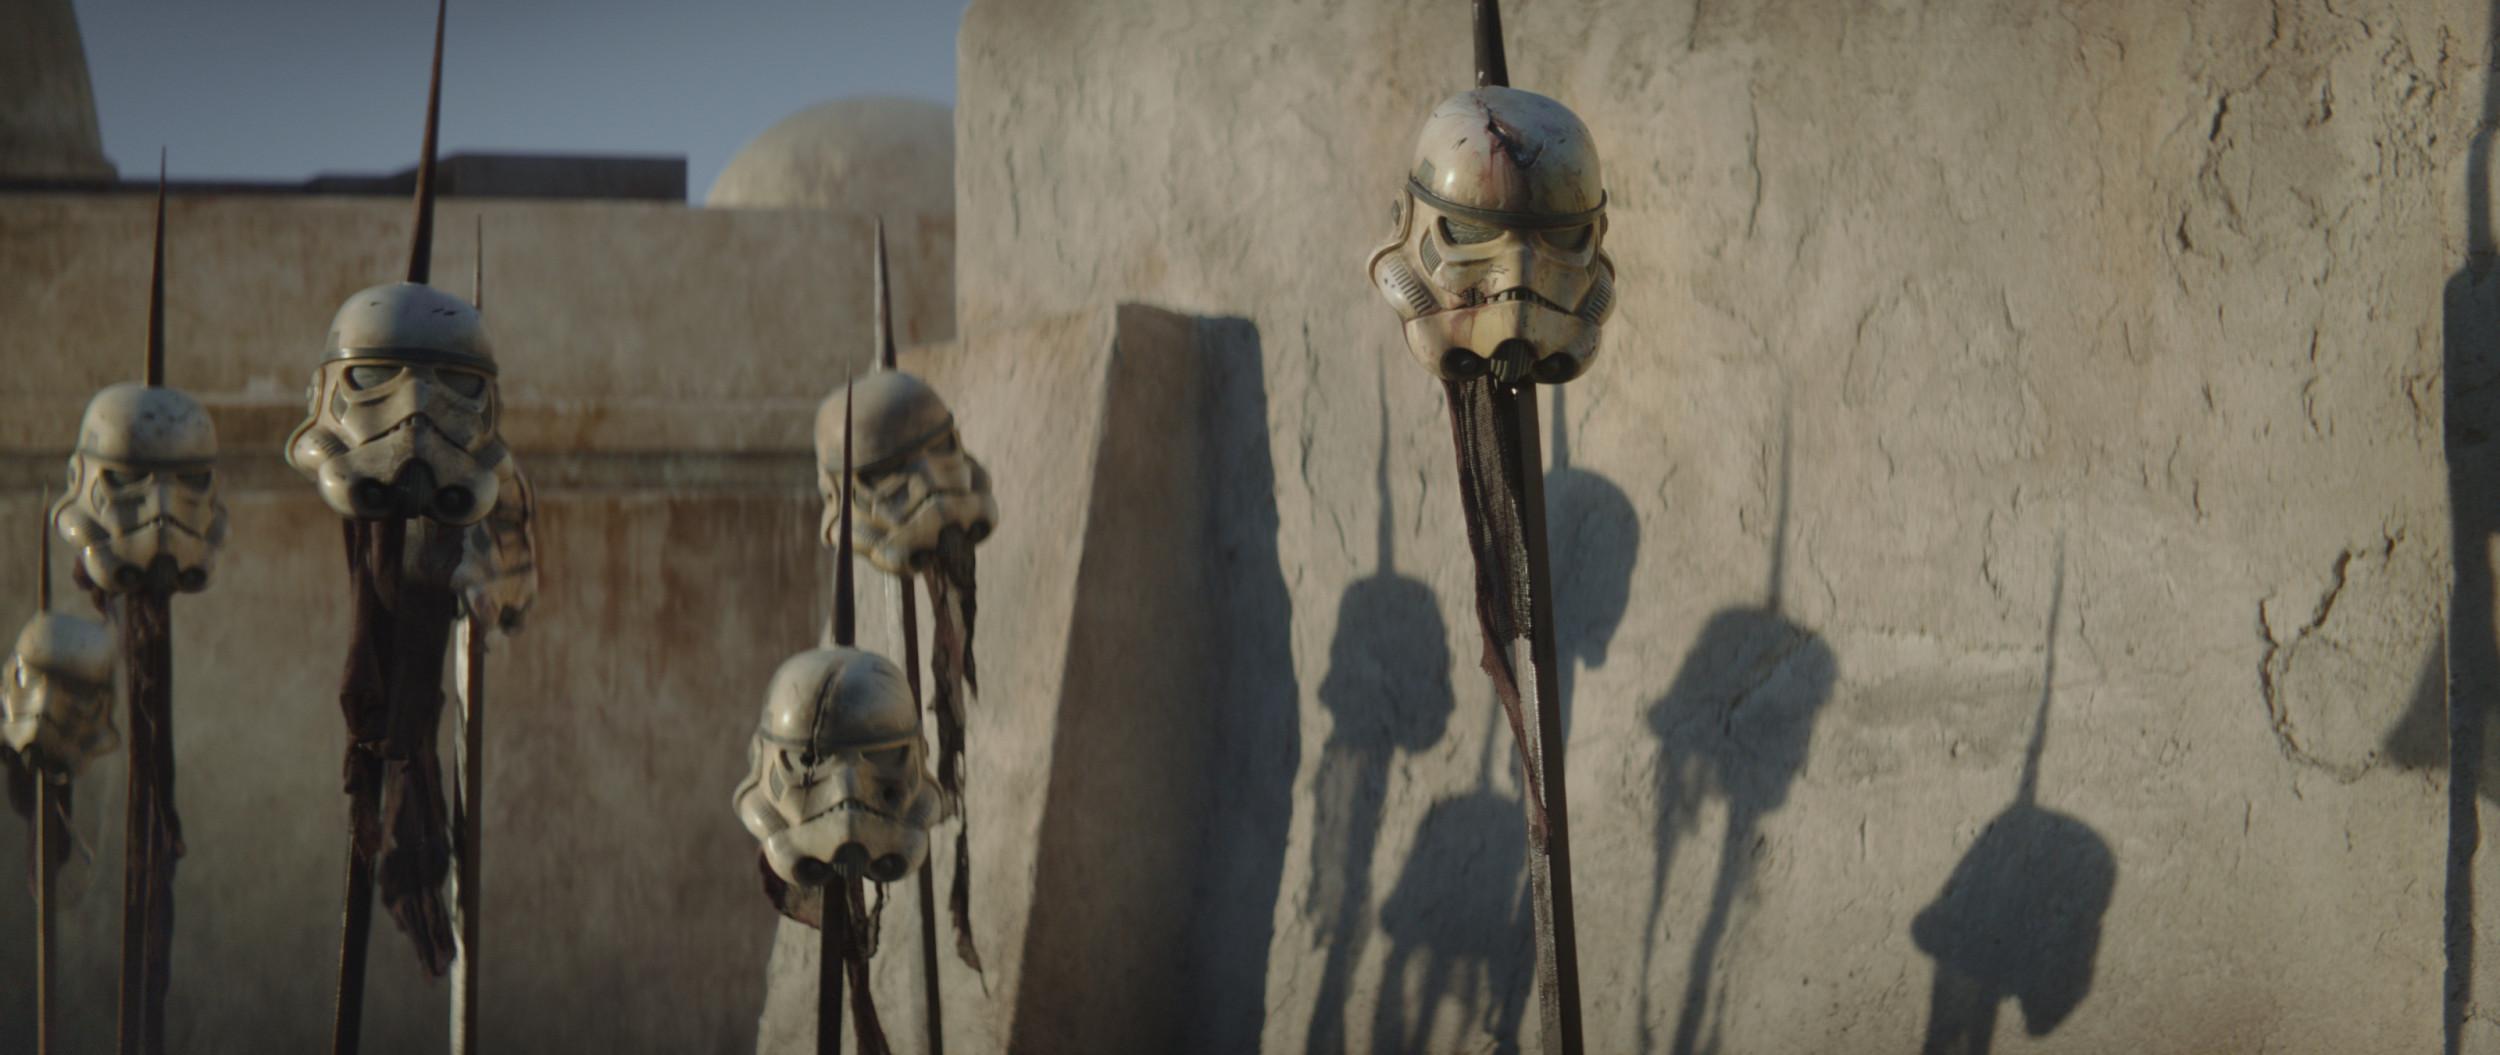 stormtroopers-mandalorian.jpg